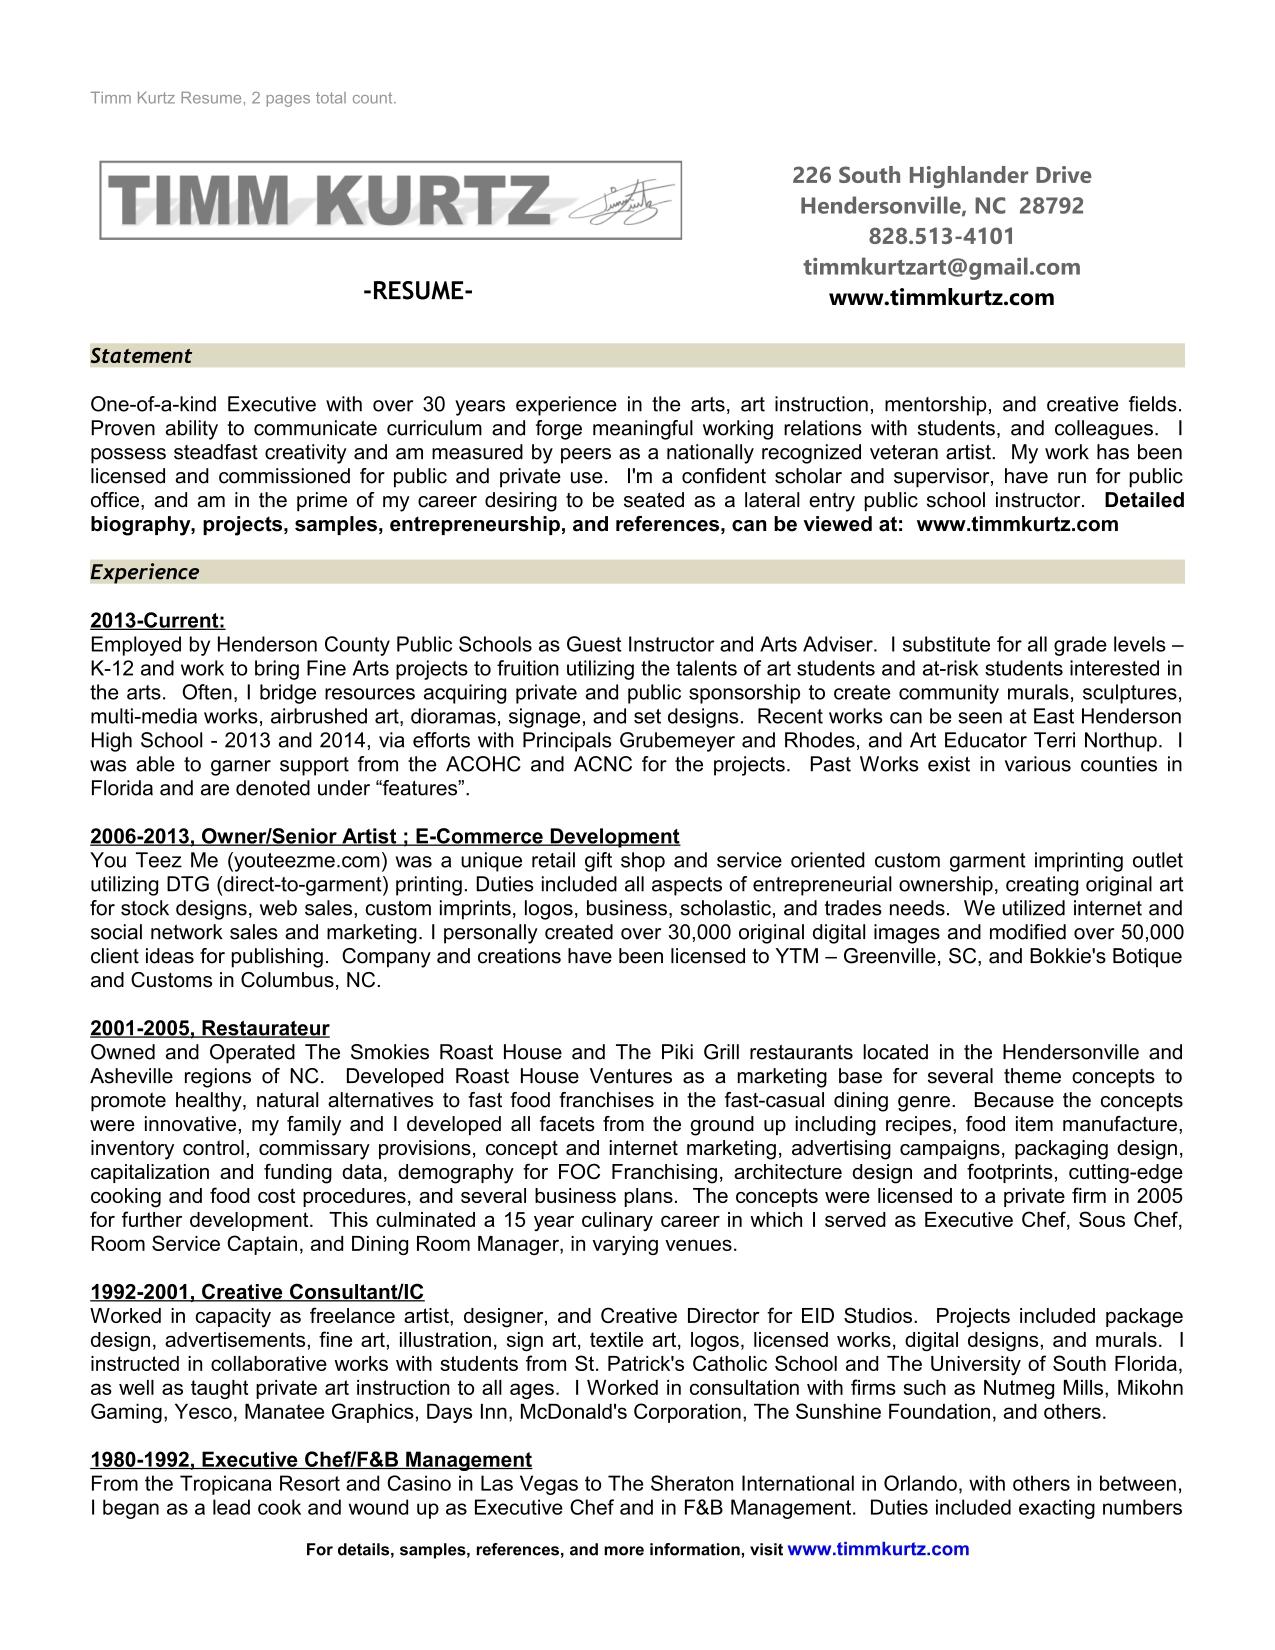 resume page 1-2015.jpg